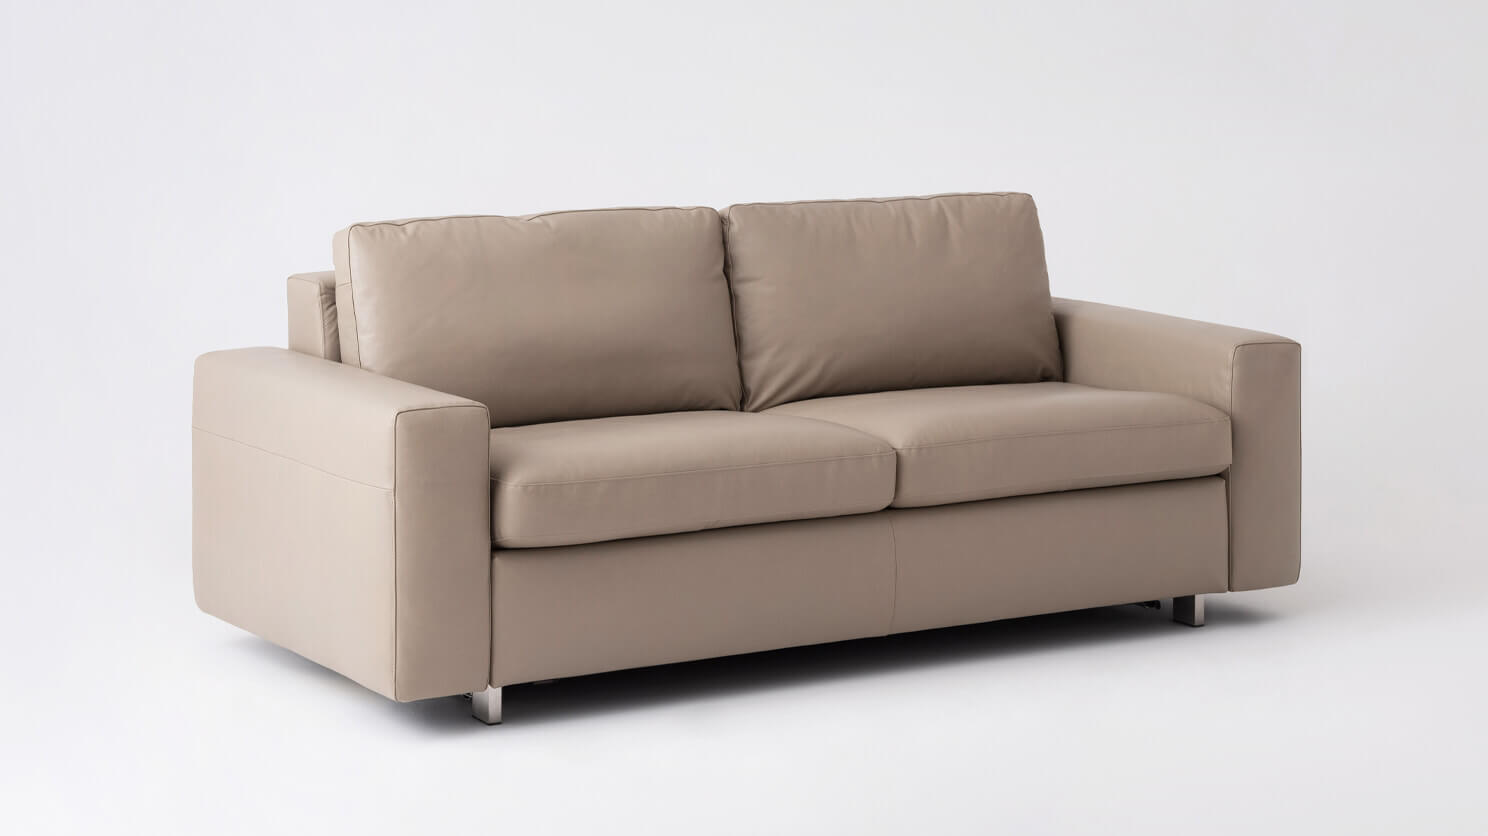 Enjoyable Reva Sleeper Sofa Fabric D3 Home Lamtechconsult Wood Chair Design Ideas Lamtechconsultcom